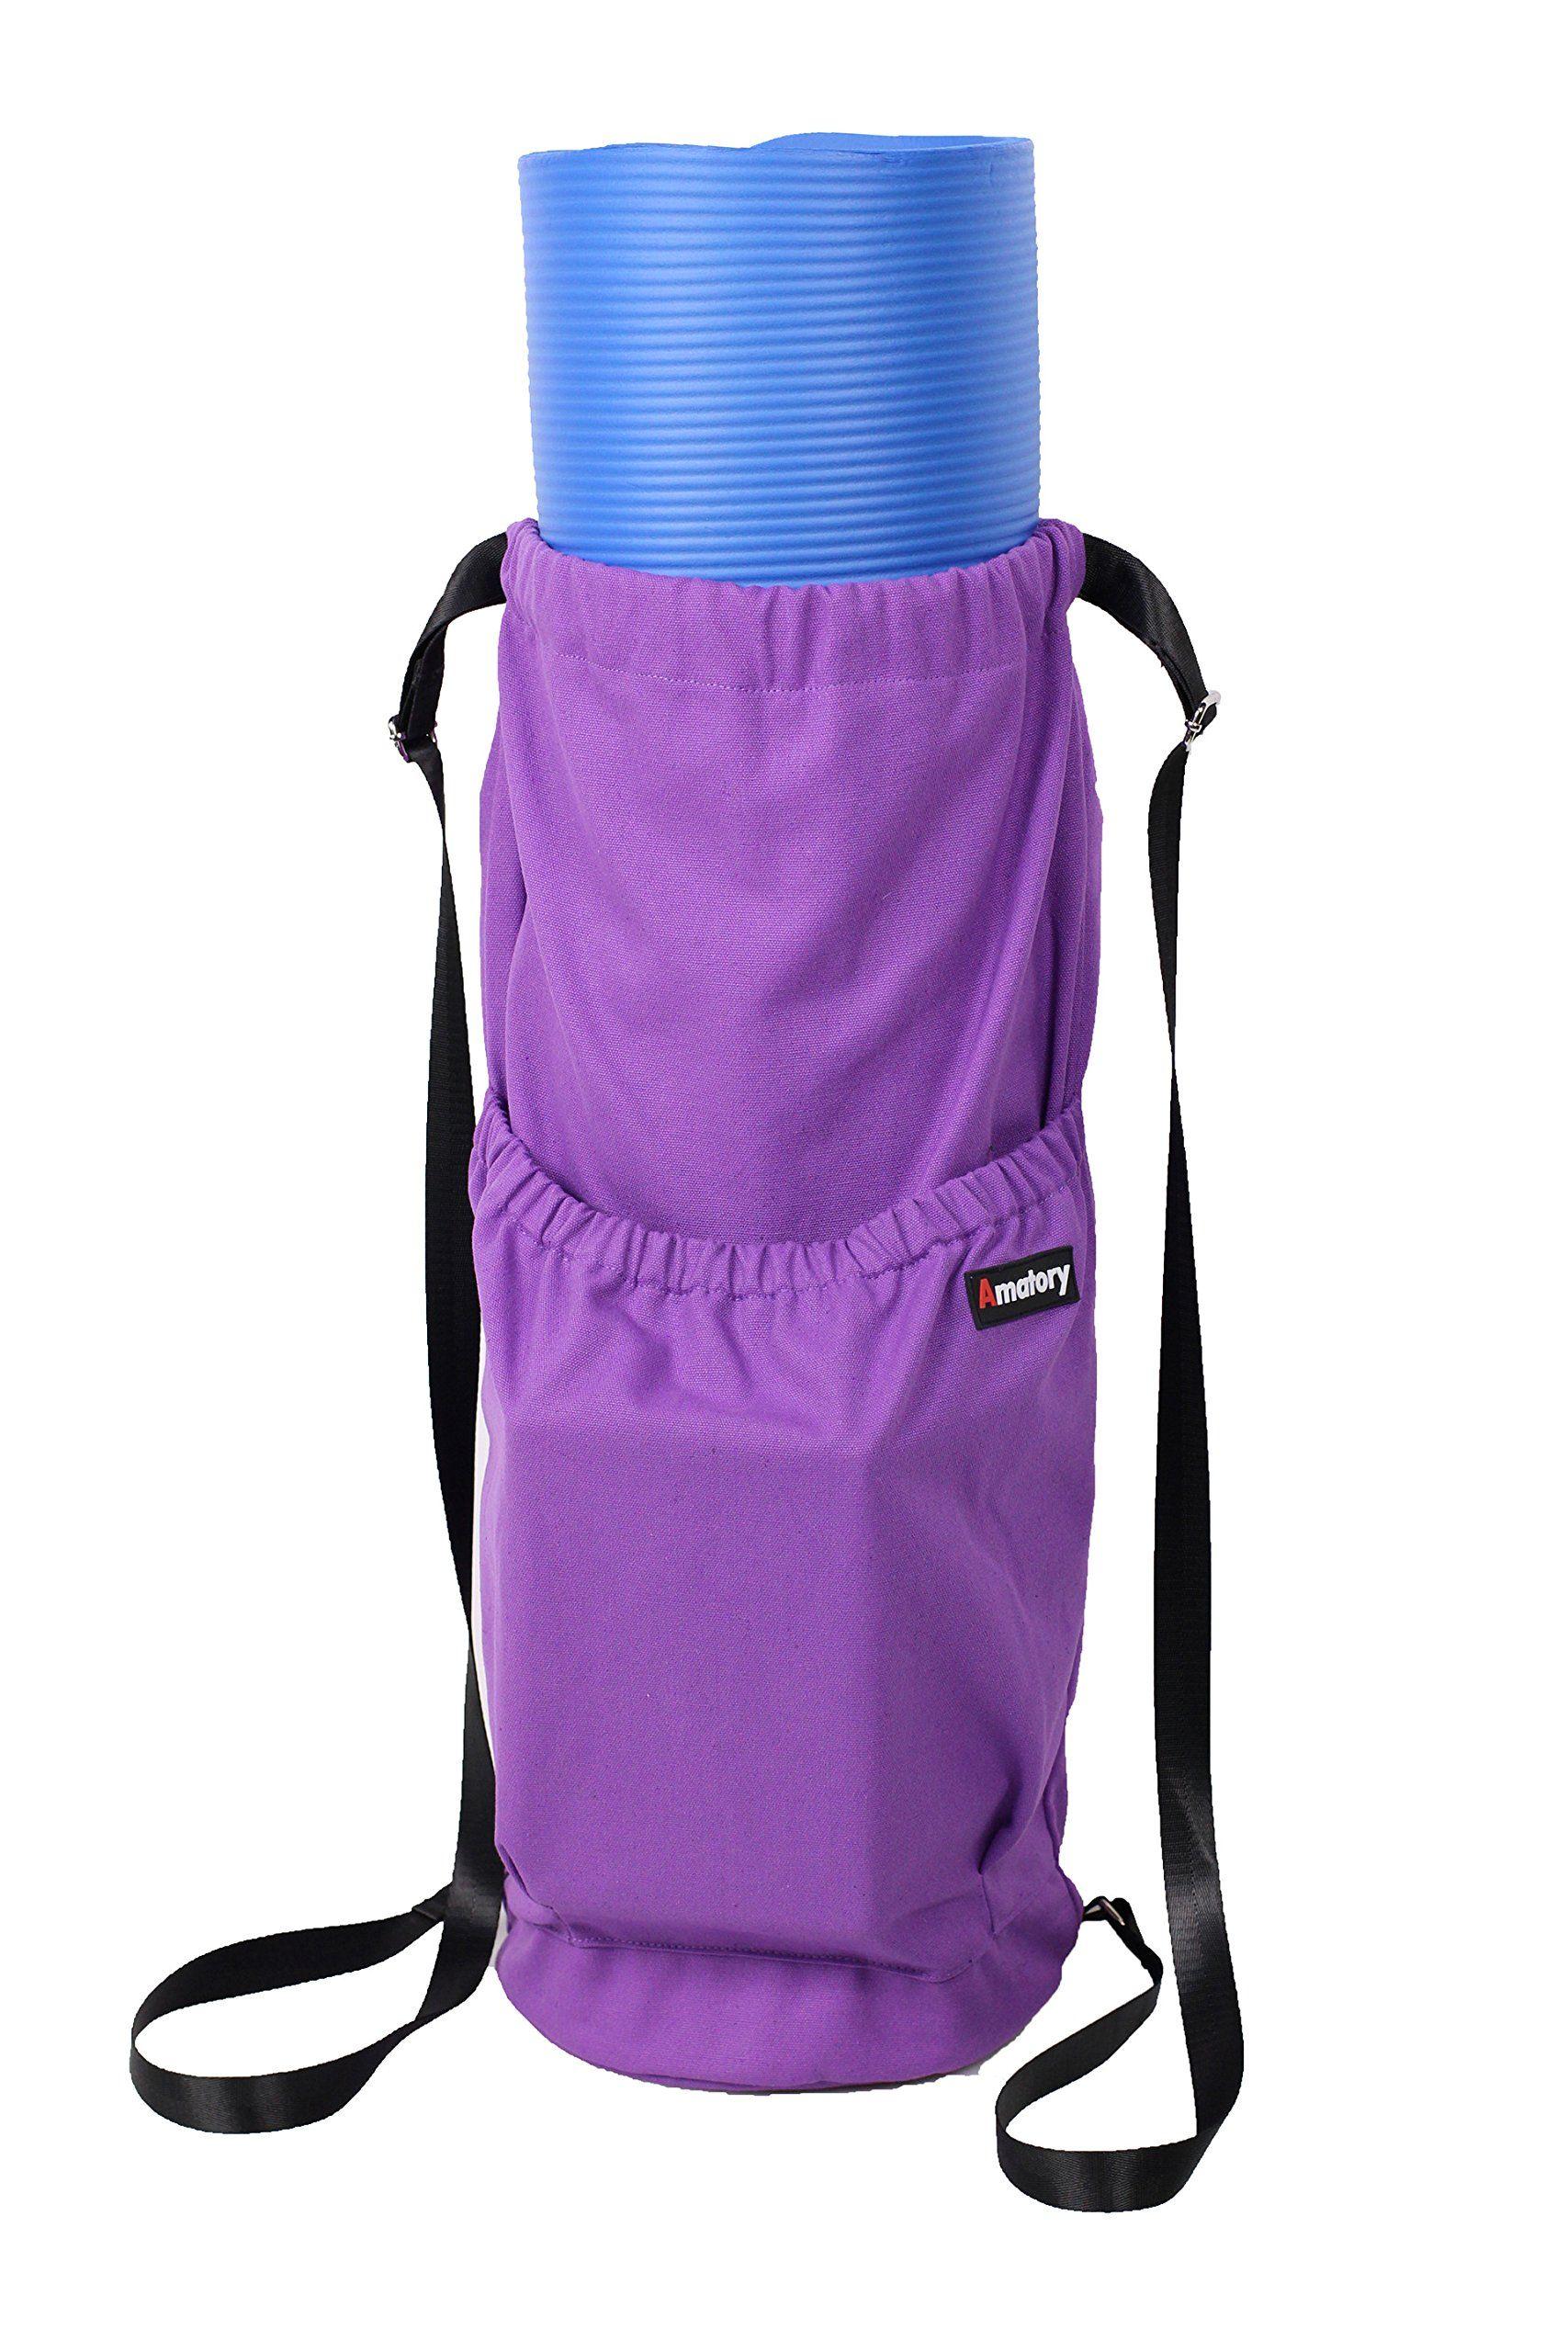 Handmade Mat Yoga Carry Bag Sling Bags Exercise Fitness Hmong Embroidered Thai